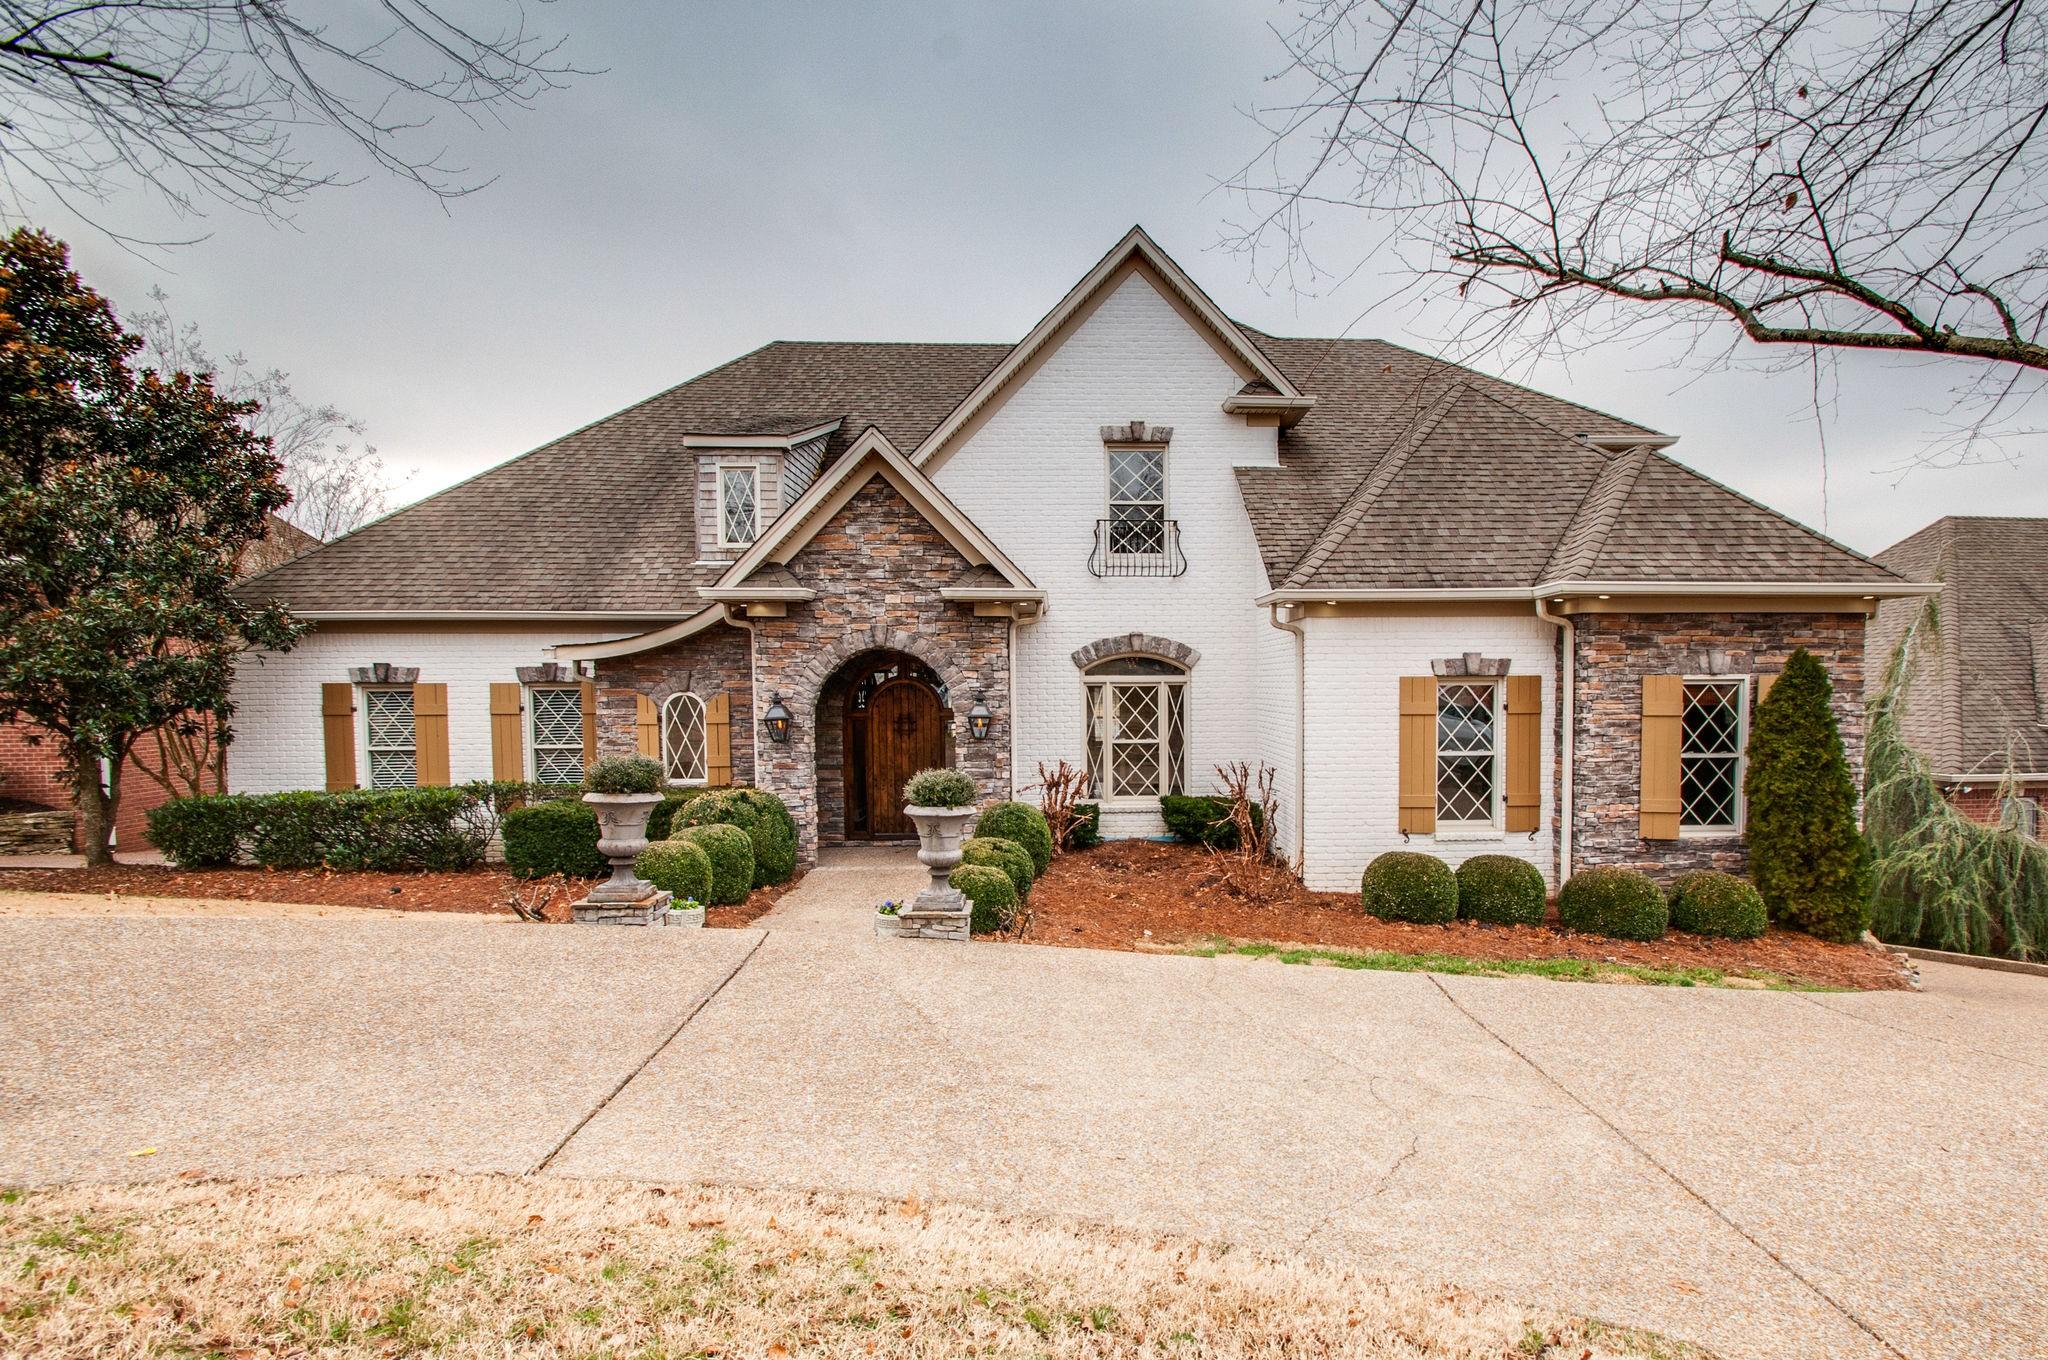 1012 Calebs Walk, Goodlettsville, TN 37072 - Goodlettsville, TN real estate listing